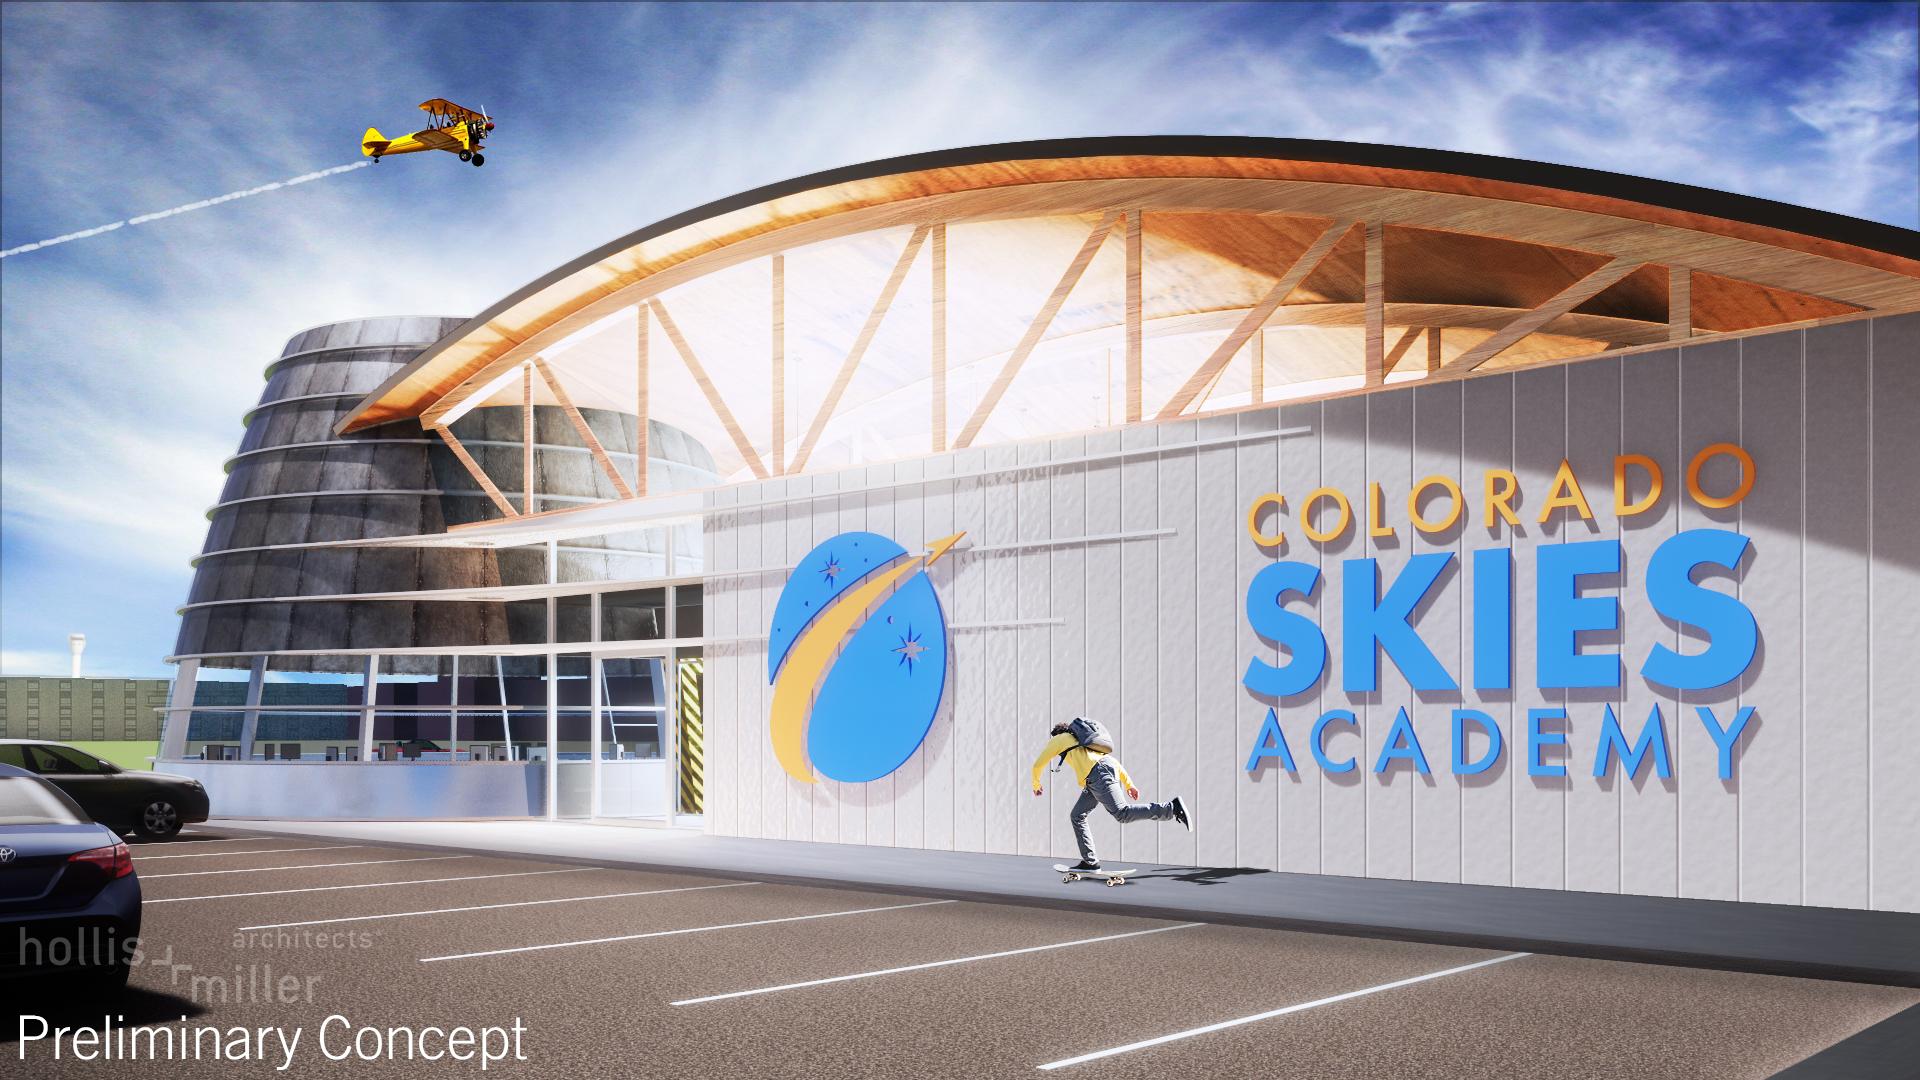 Colorado Skies Academy S